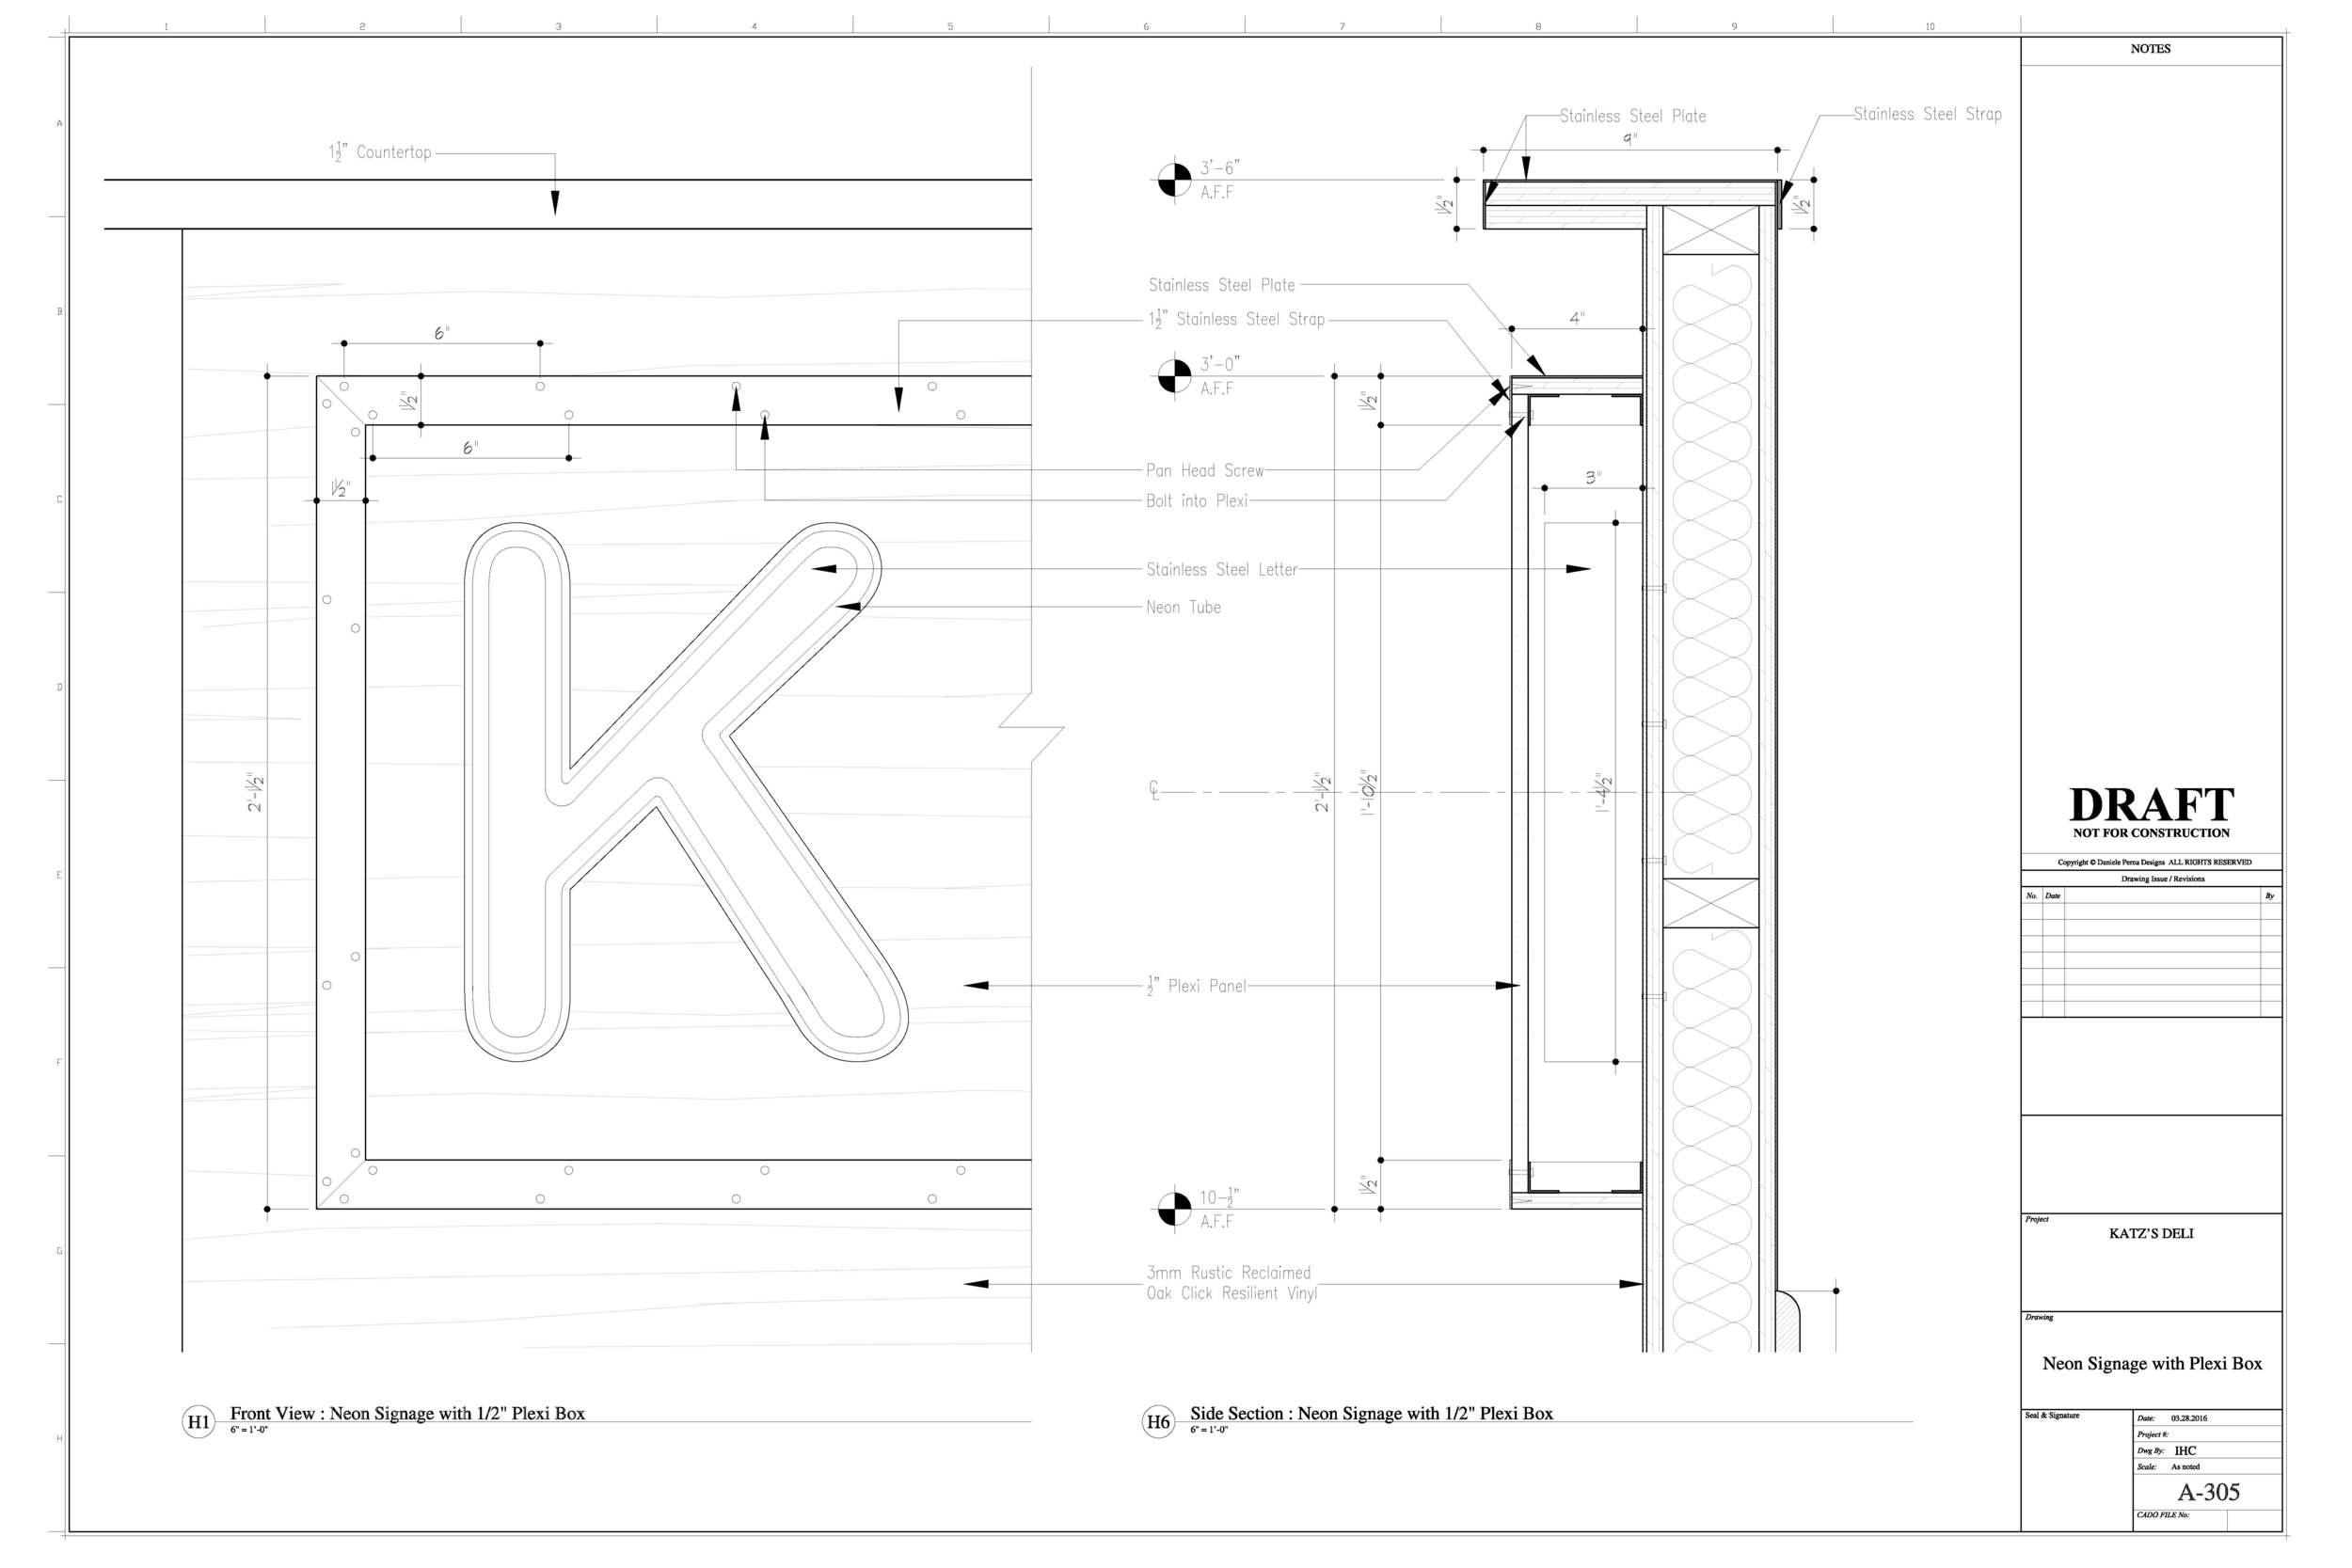 Katz's BK drawing set_Page_10.jpg